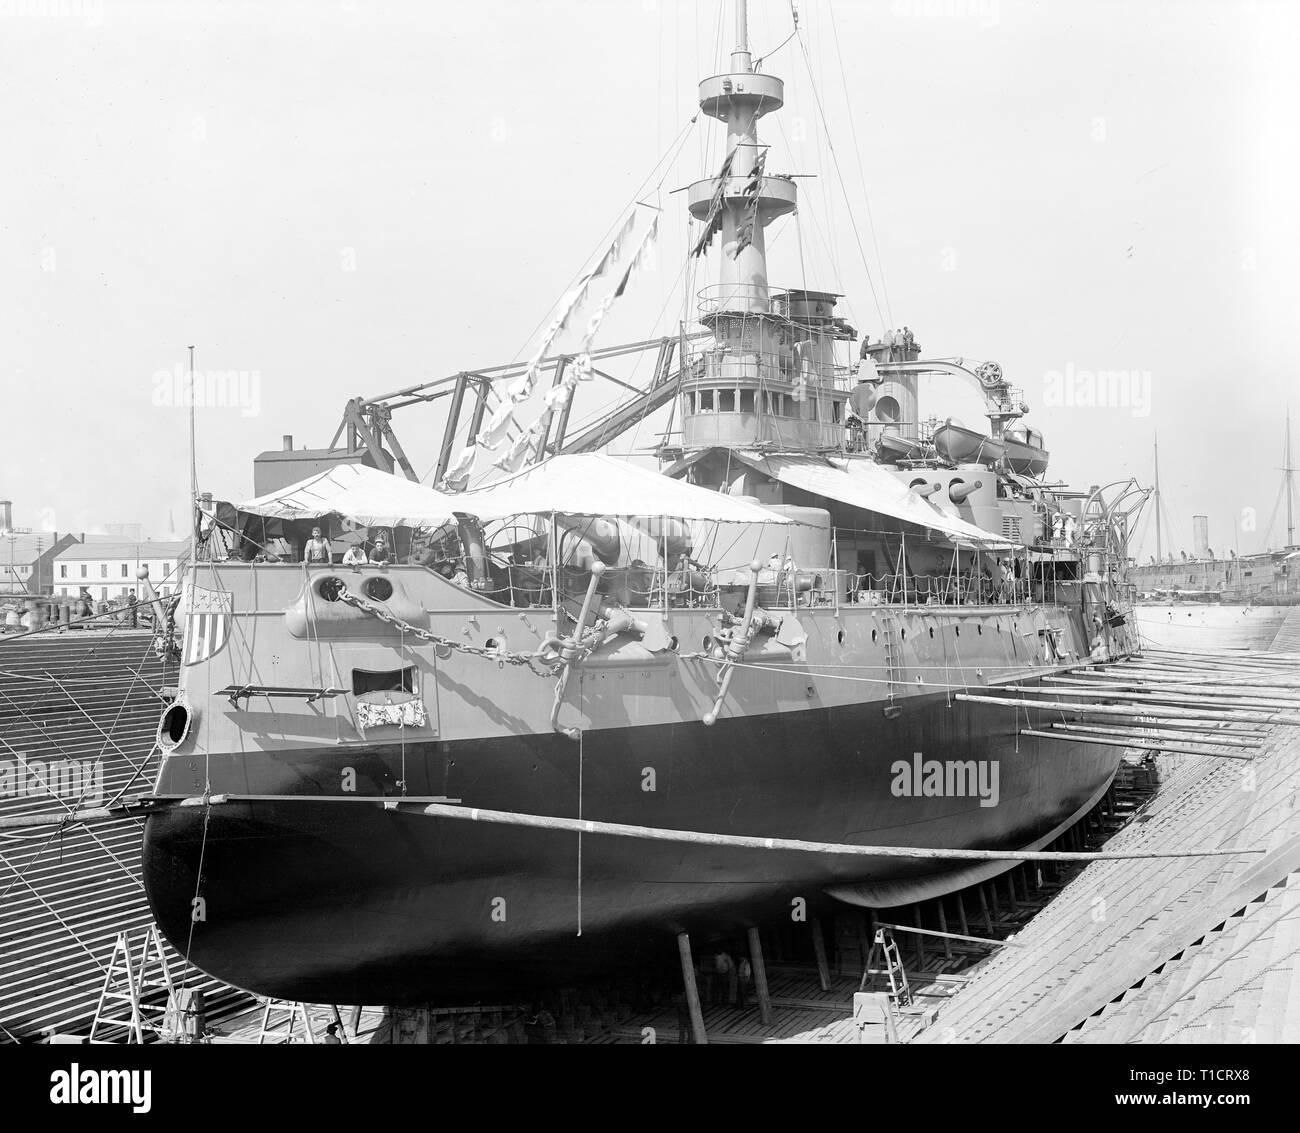 USS Missouri im Trockendock, Brooklyn Navy Yard, 1898 Stockbild